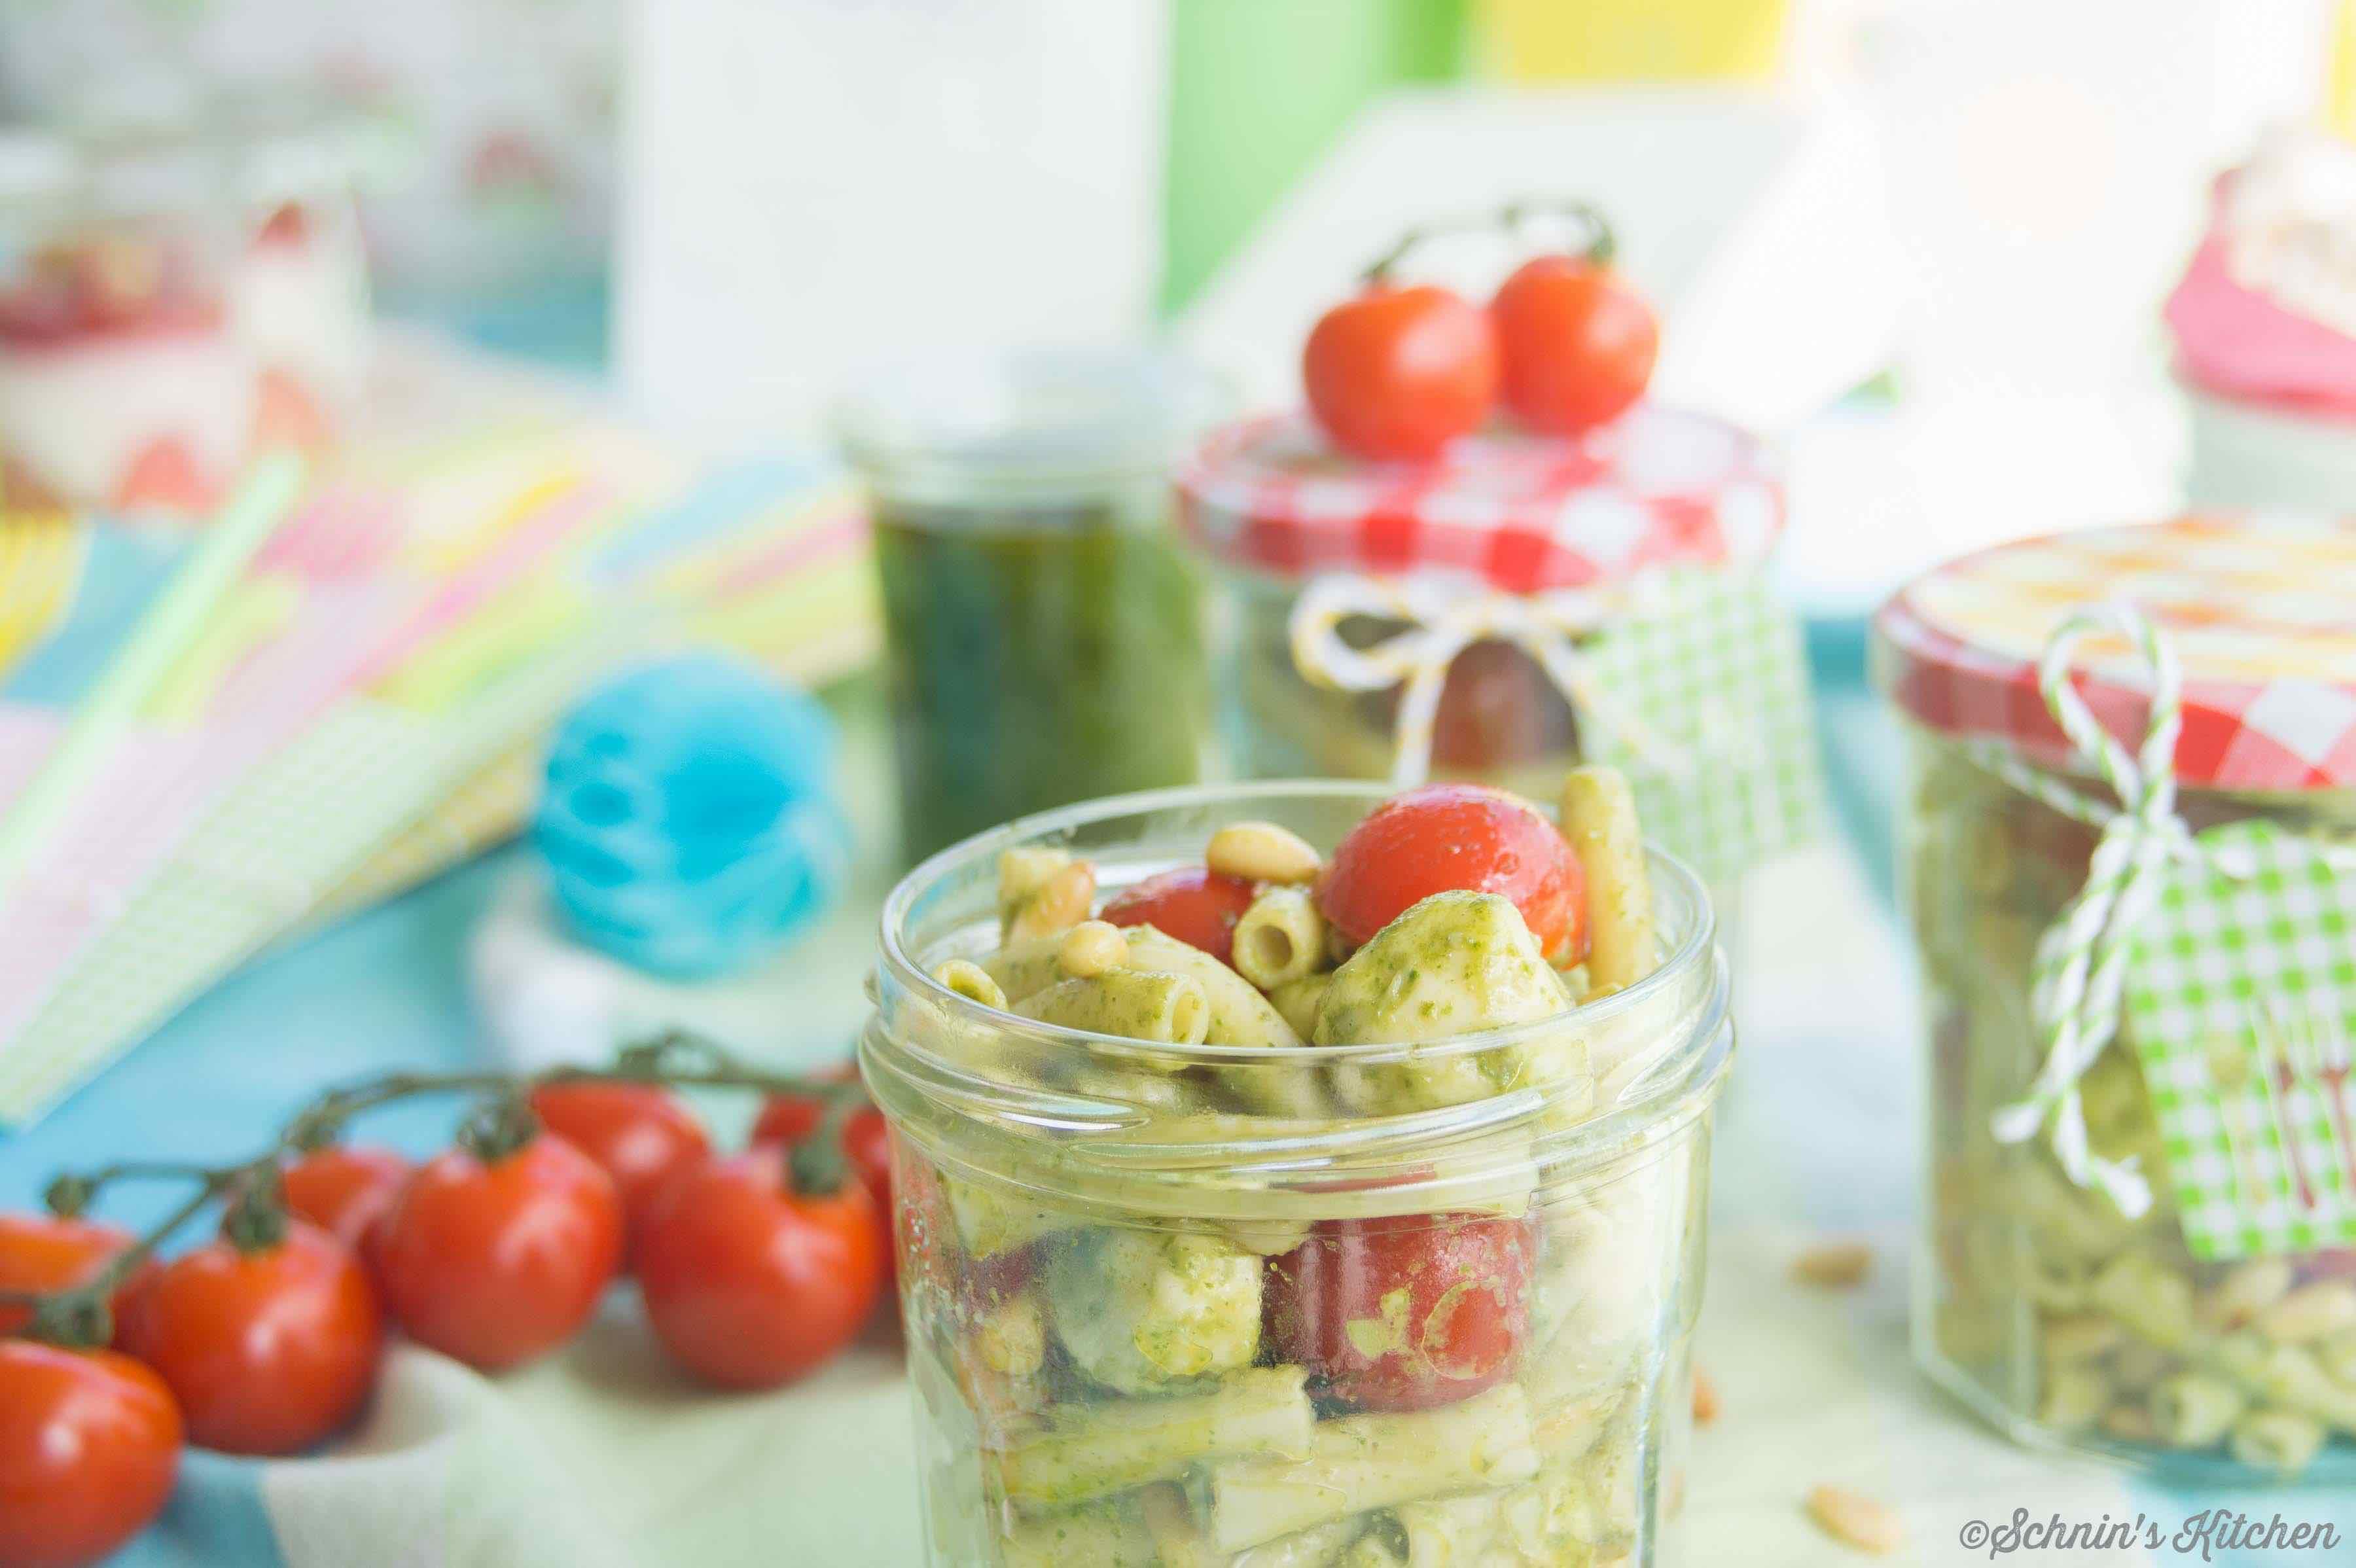 Schnin's Kitchen: Nudelsalat mit Pesto